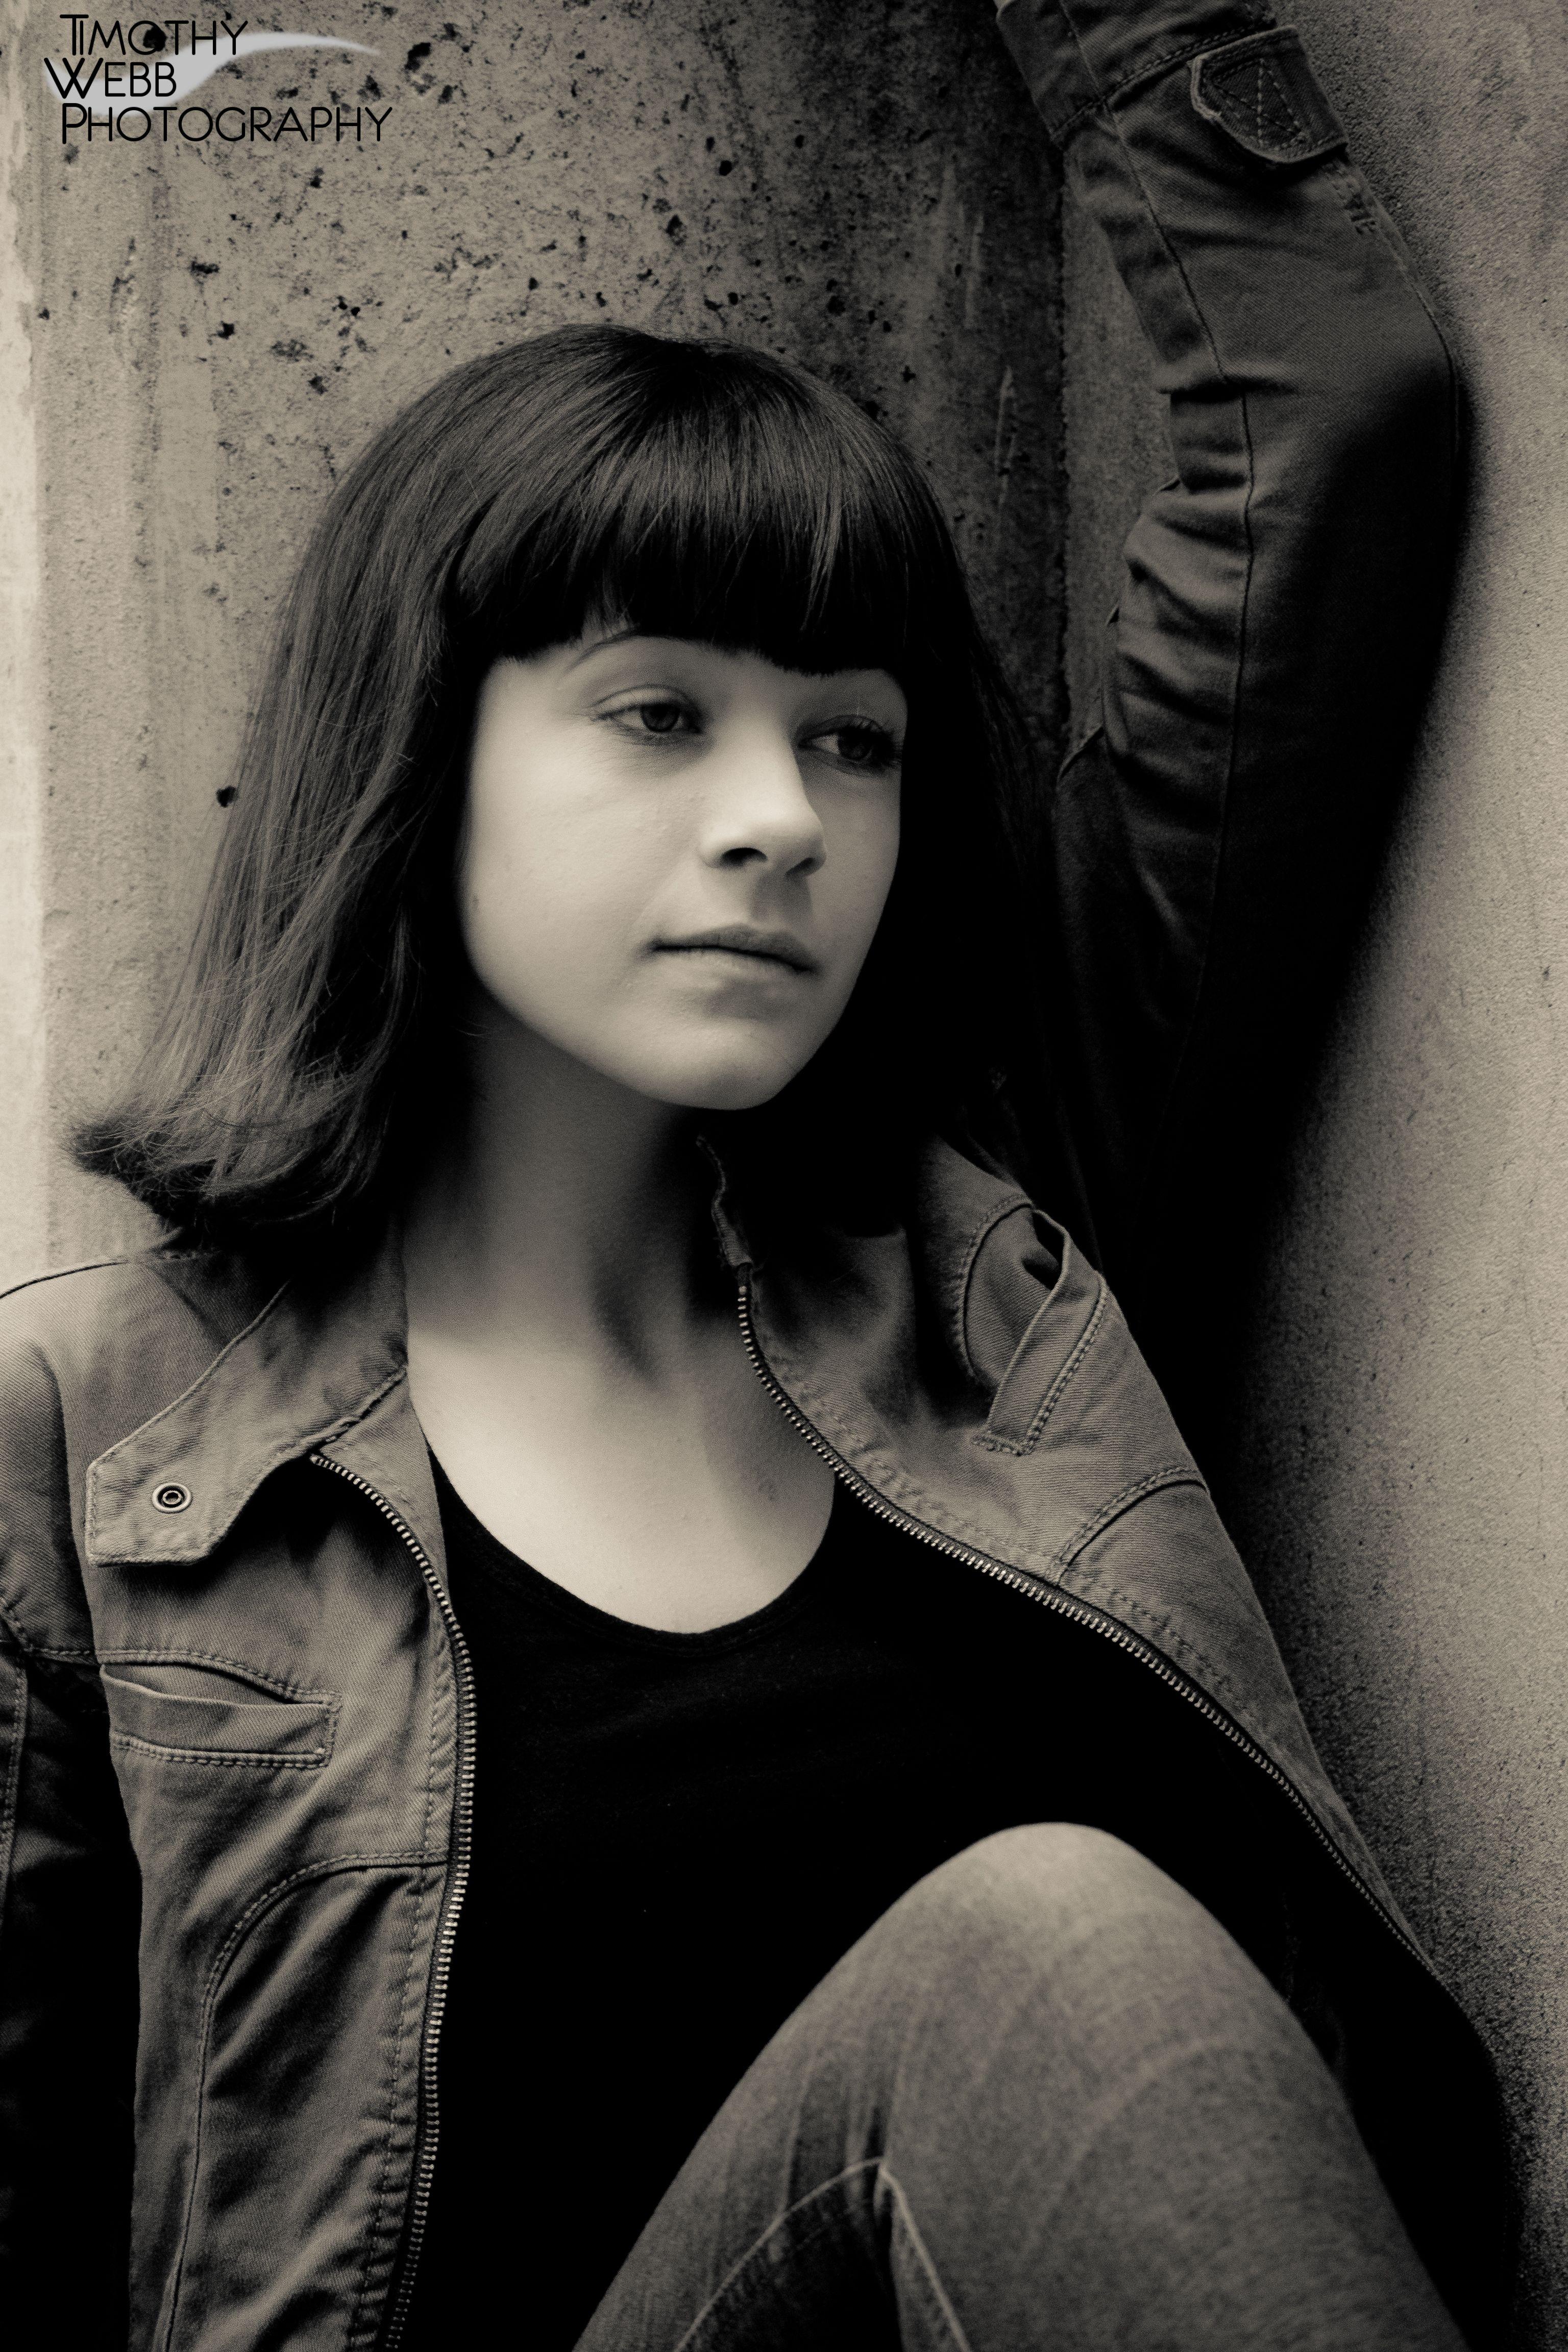 Sabina  #jacket #jeans #brunette #timothywebbphotography